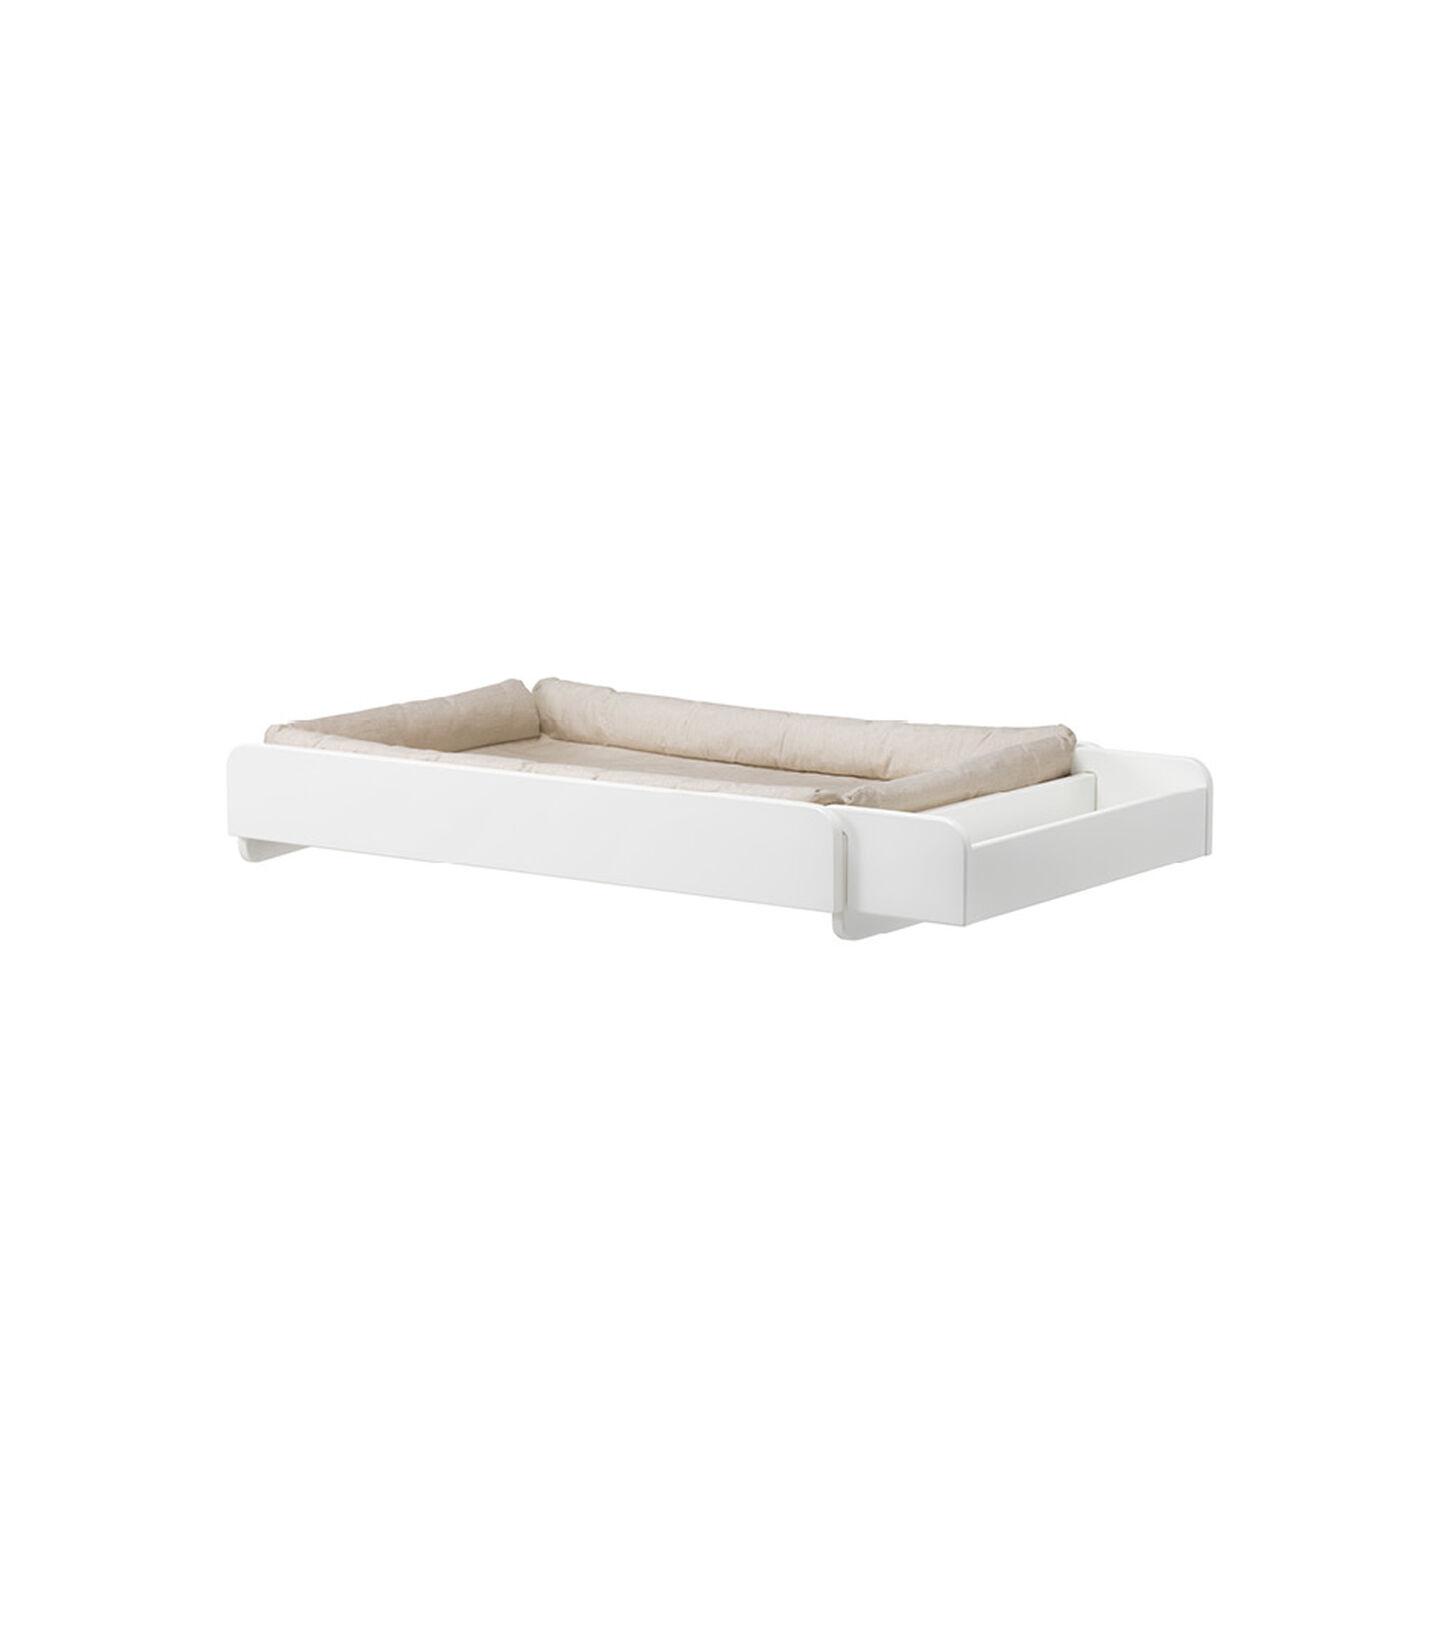 Stokke® Home™ Changer mit Matratze, White, White, mainview view 2